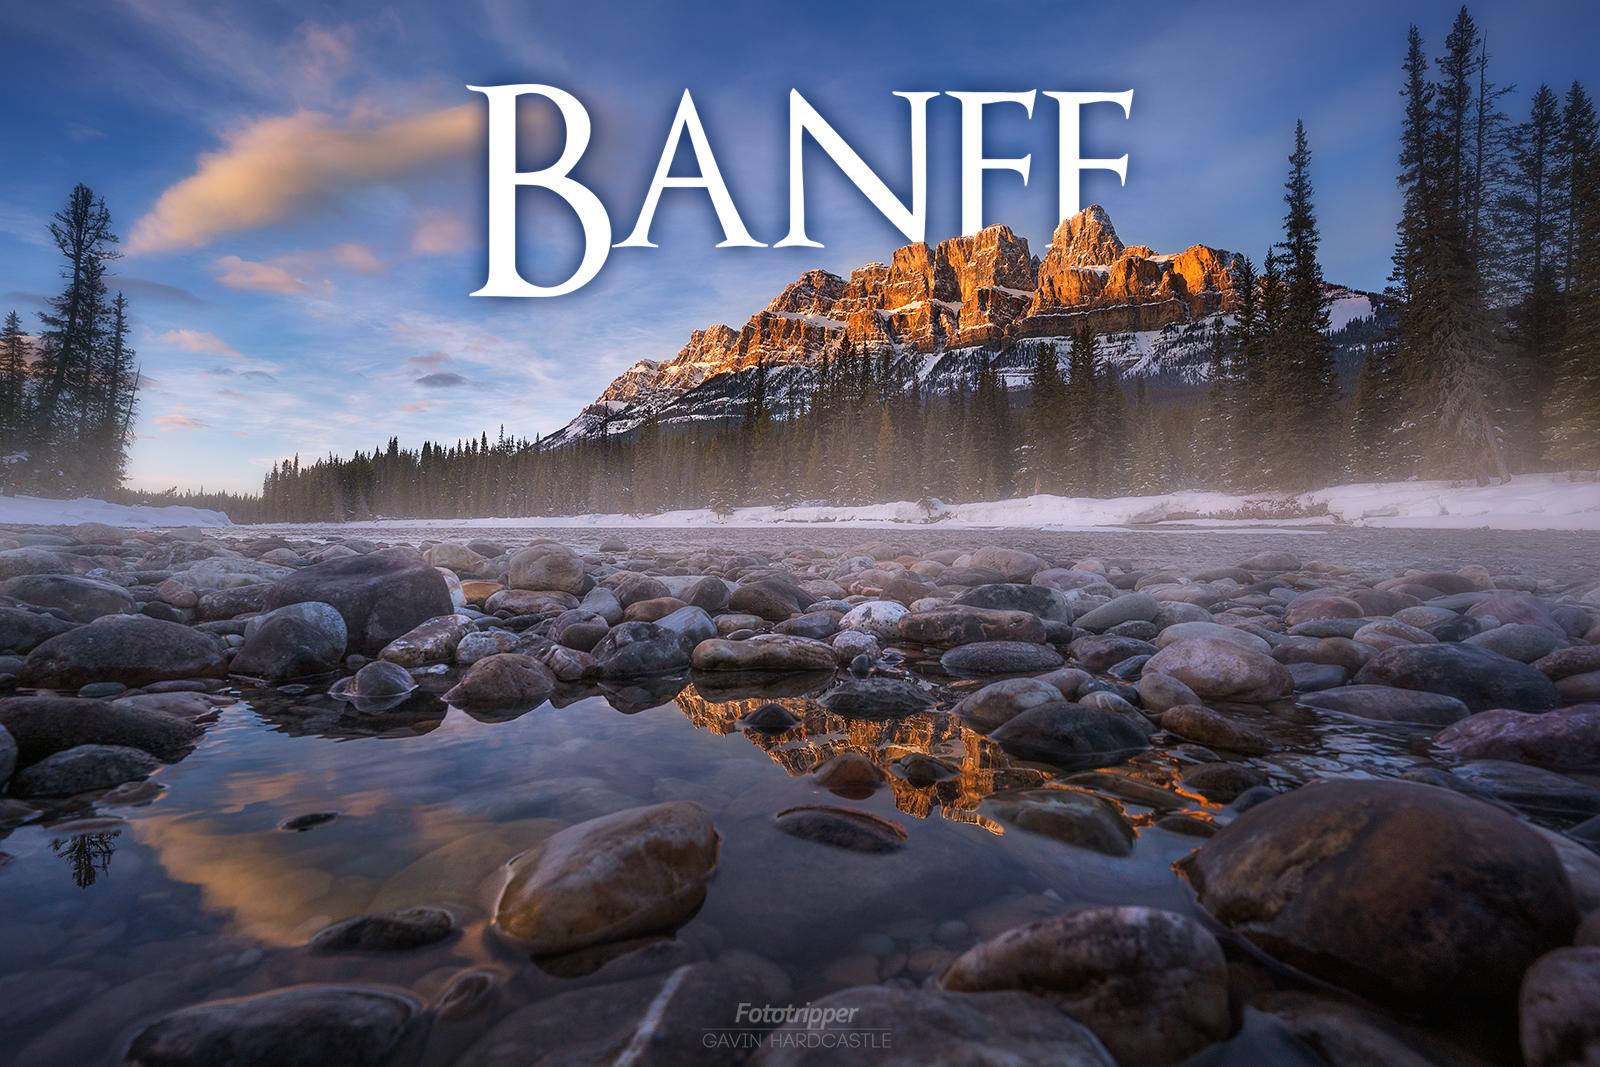 Banff Photography Workshop with Gavin Hardcastle